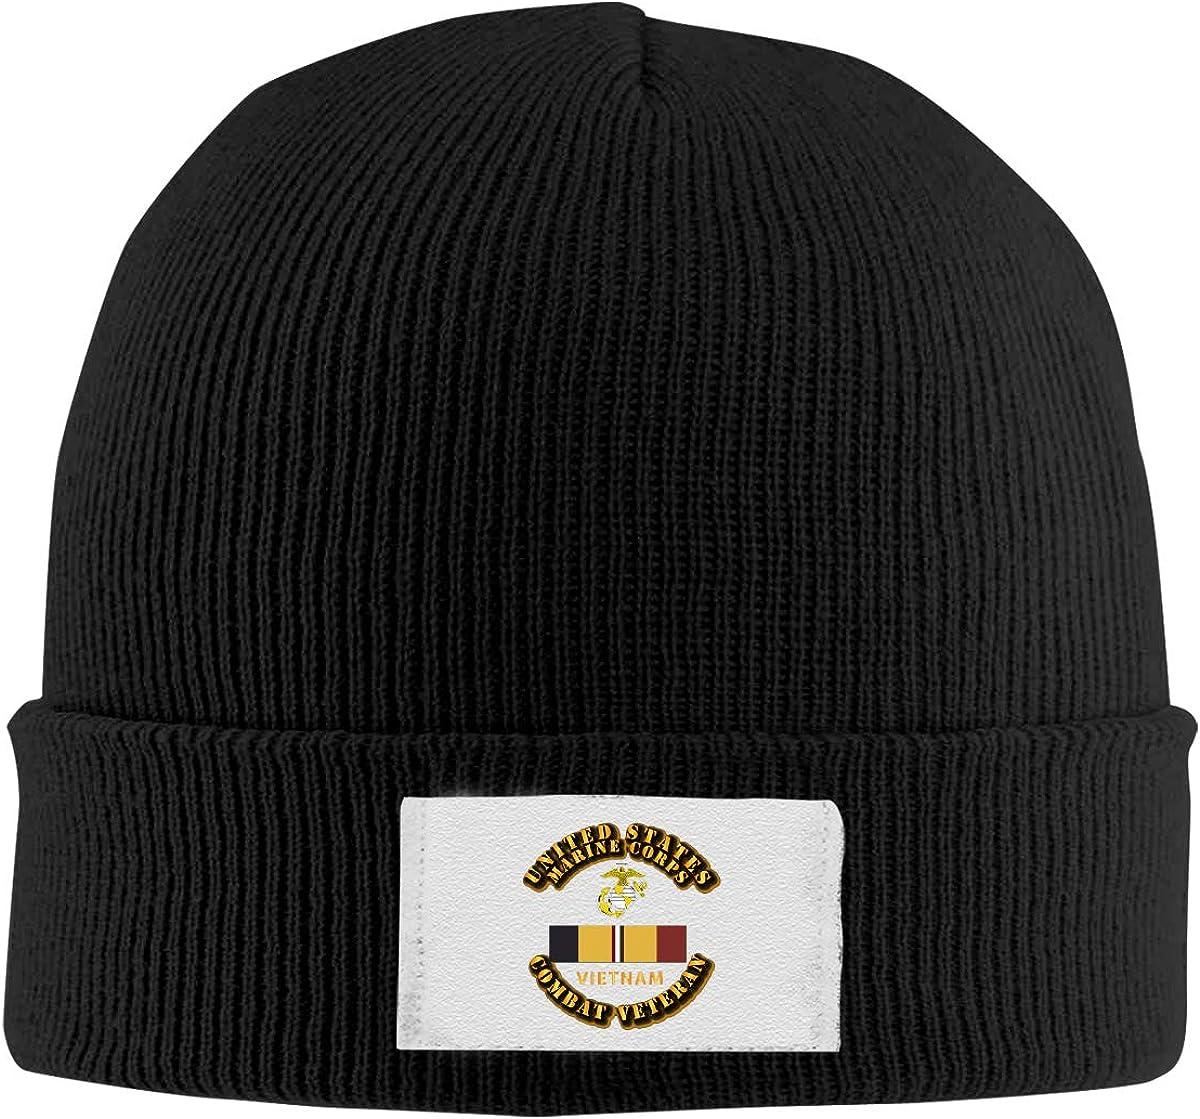 Unisex Stylish Slouch Beanie Hats Black USMC Combat Veteran Logo Top Level Beanie Men Women